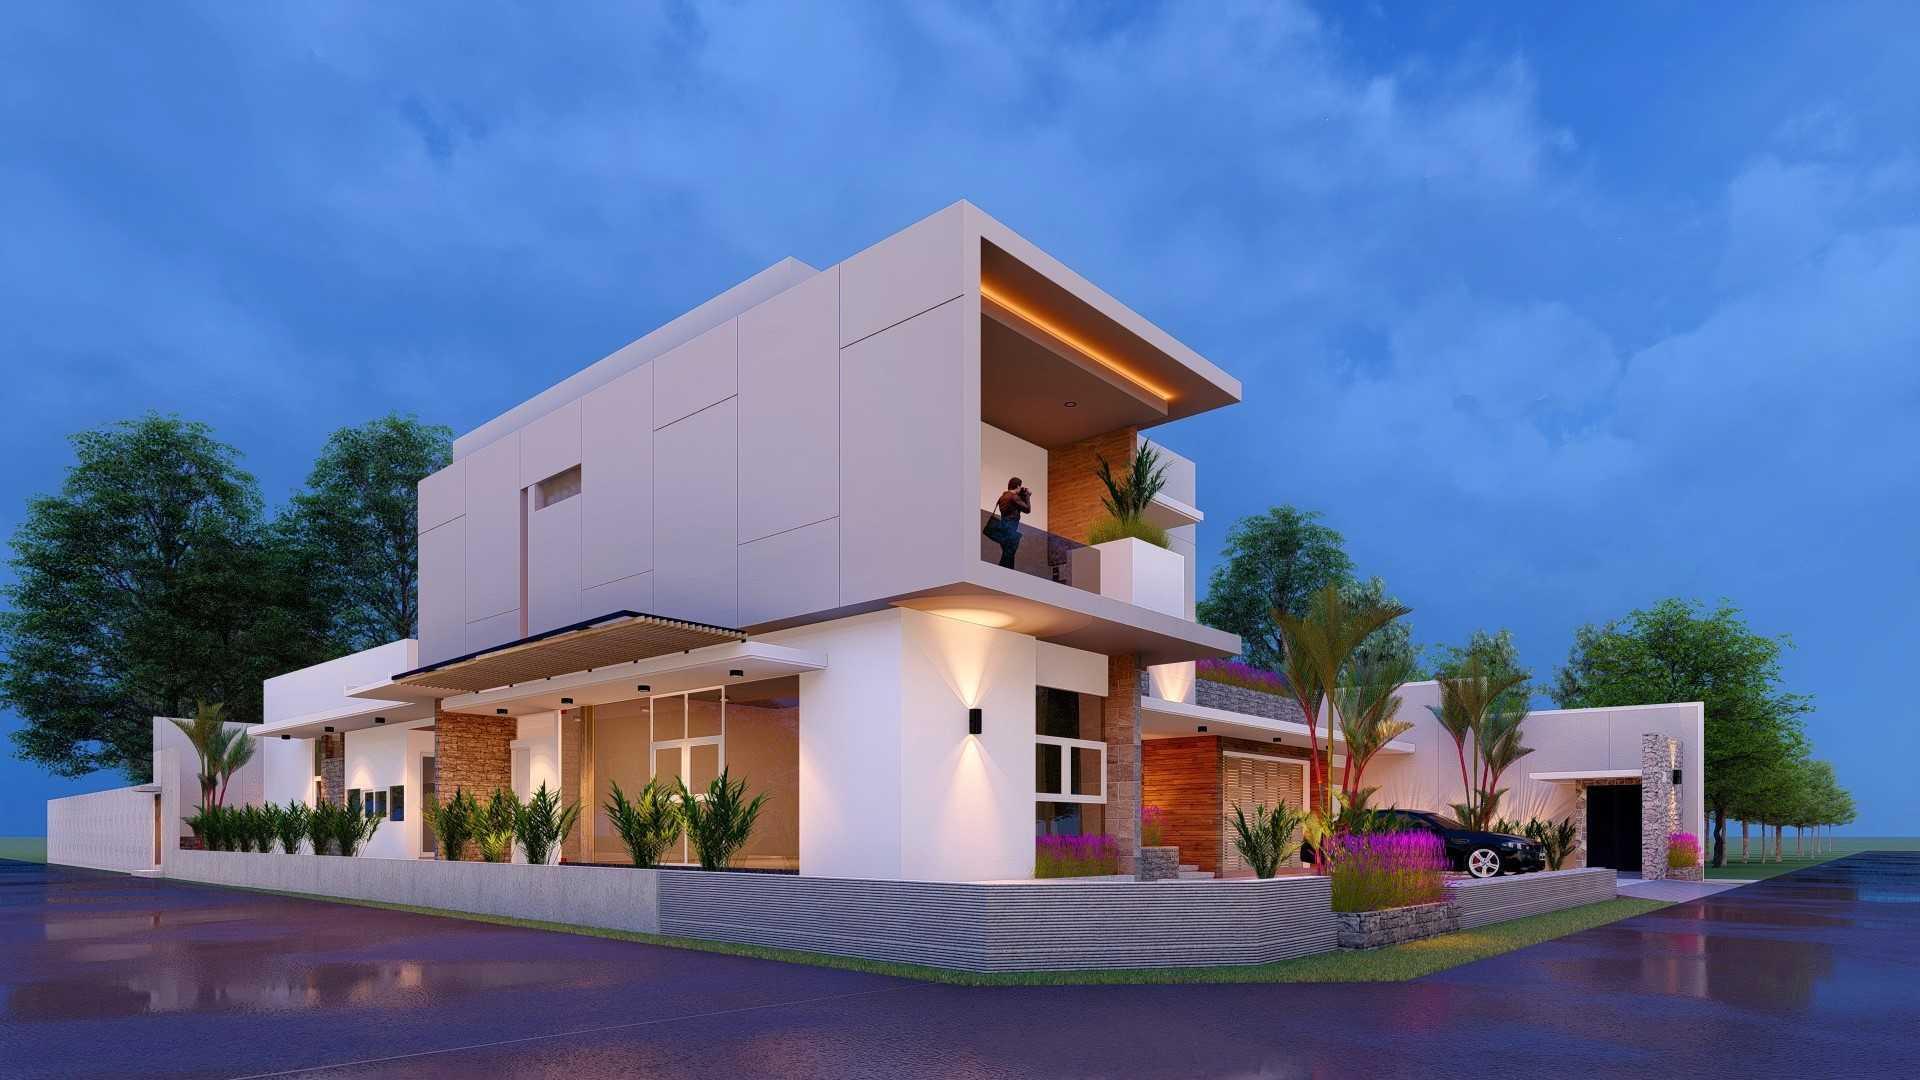 Conarch Studio Fr  House Surakarta, Kota Surakarta, Jawa Tengah, Indonesia Surakarta, Kota Surakarta, Jawa Tengah, Indonesia Conarch-Bangun-Sejahtera-Fr-House Modern 78903